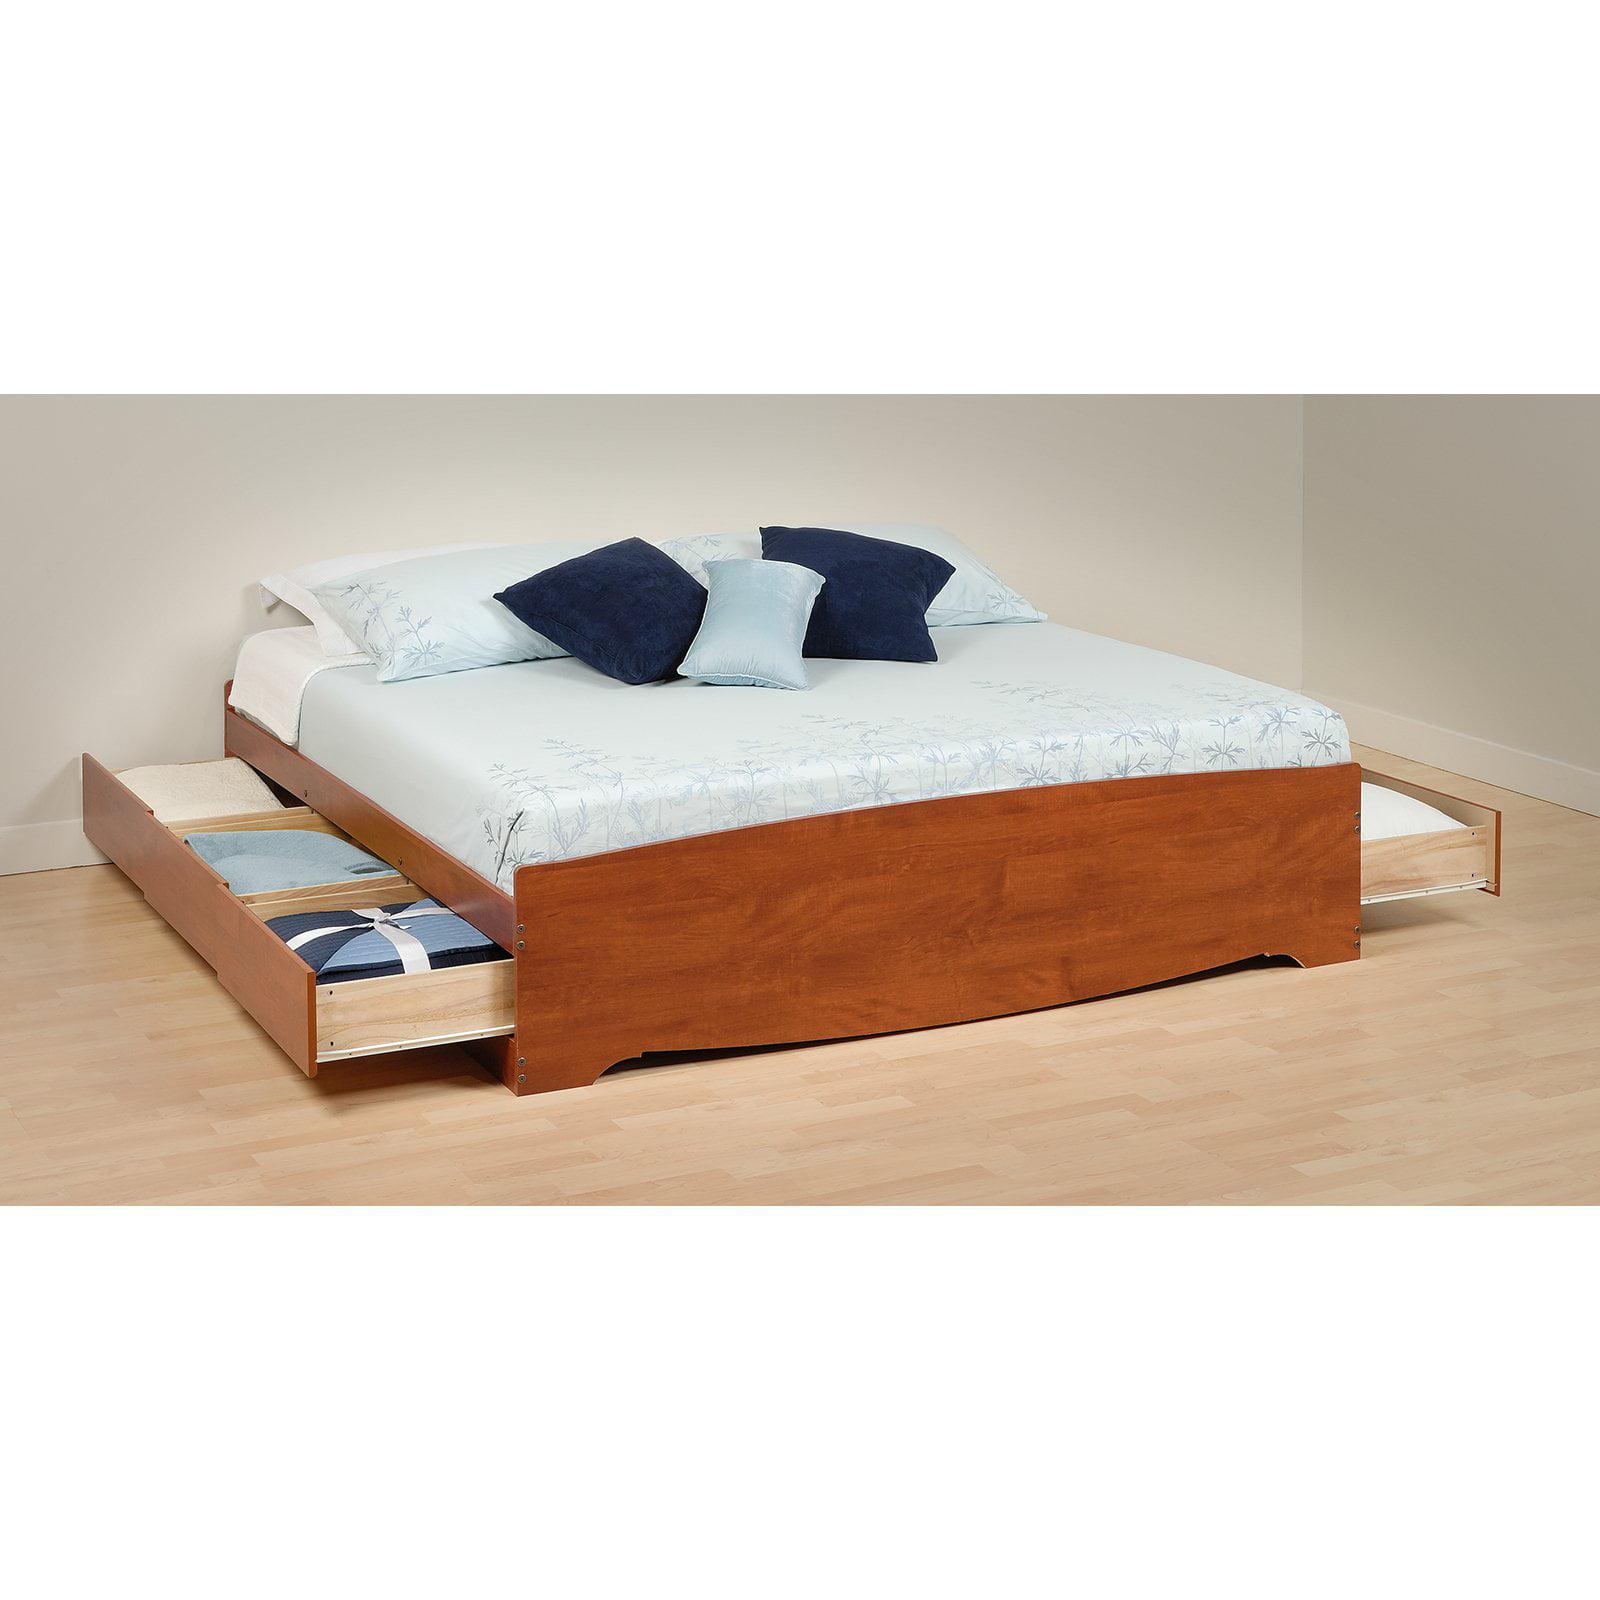 Edenvale King Platform Storage Bed, Cherry (Box 1) by Prepac Manufacturing Ltd